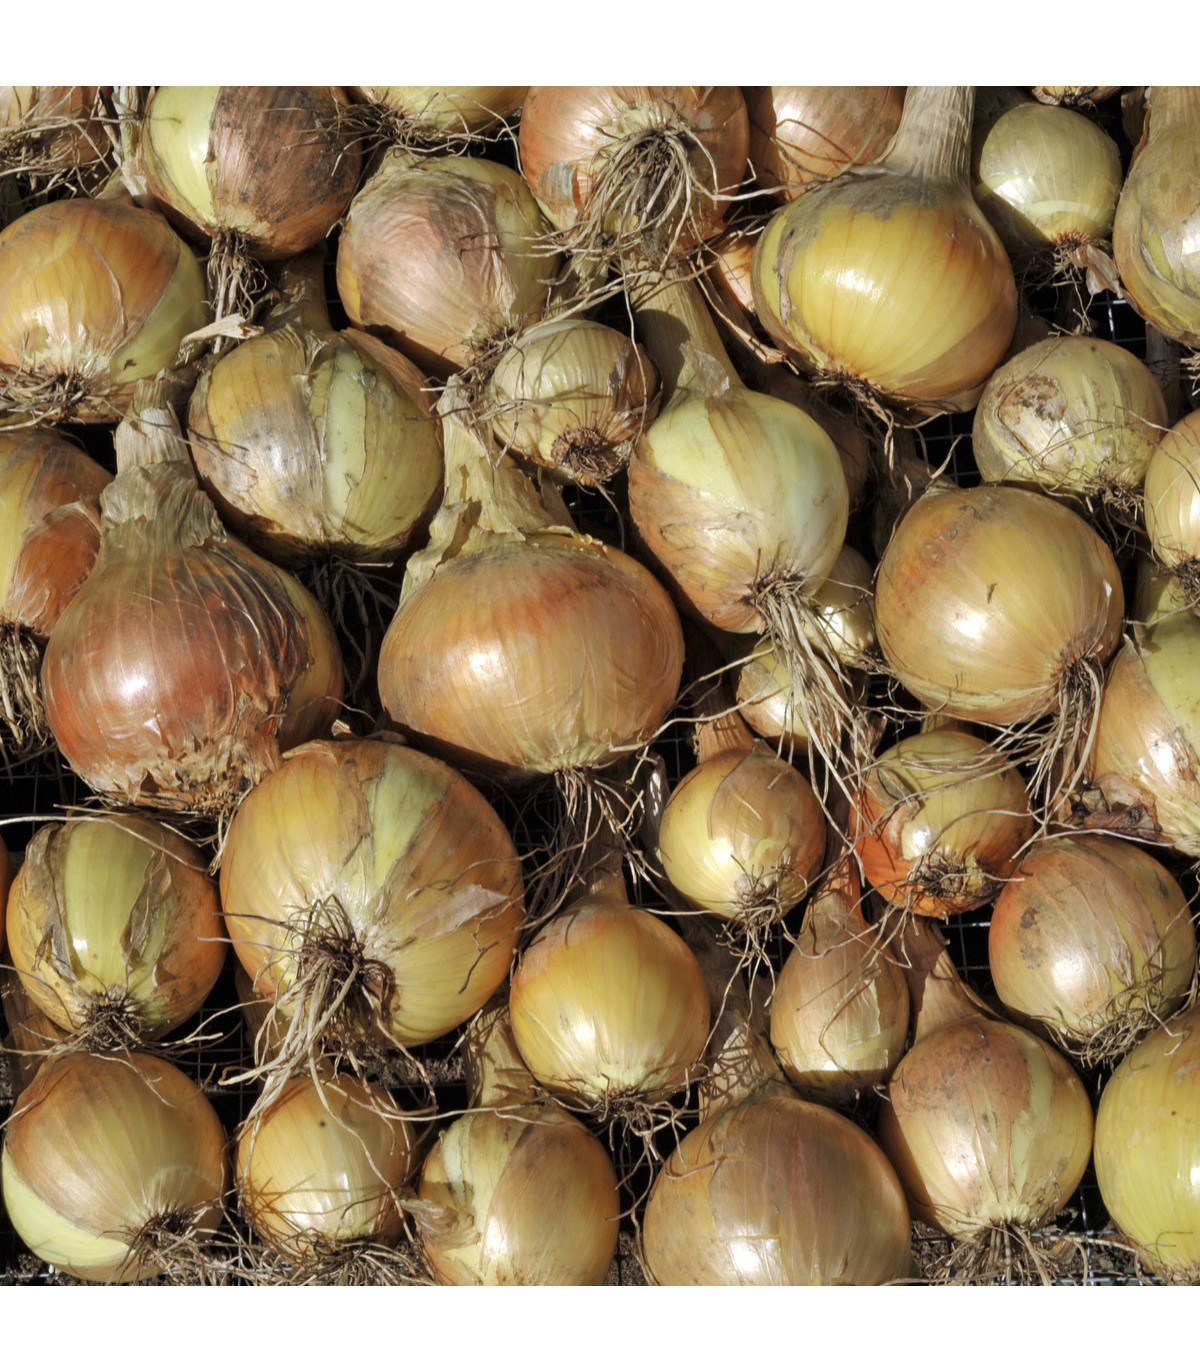 BIO Cibule jarní žlutá Sturon - Allium cepa - bio semena cibule - 500 ks